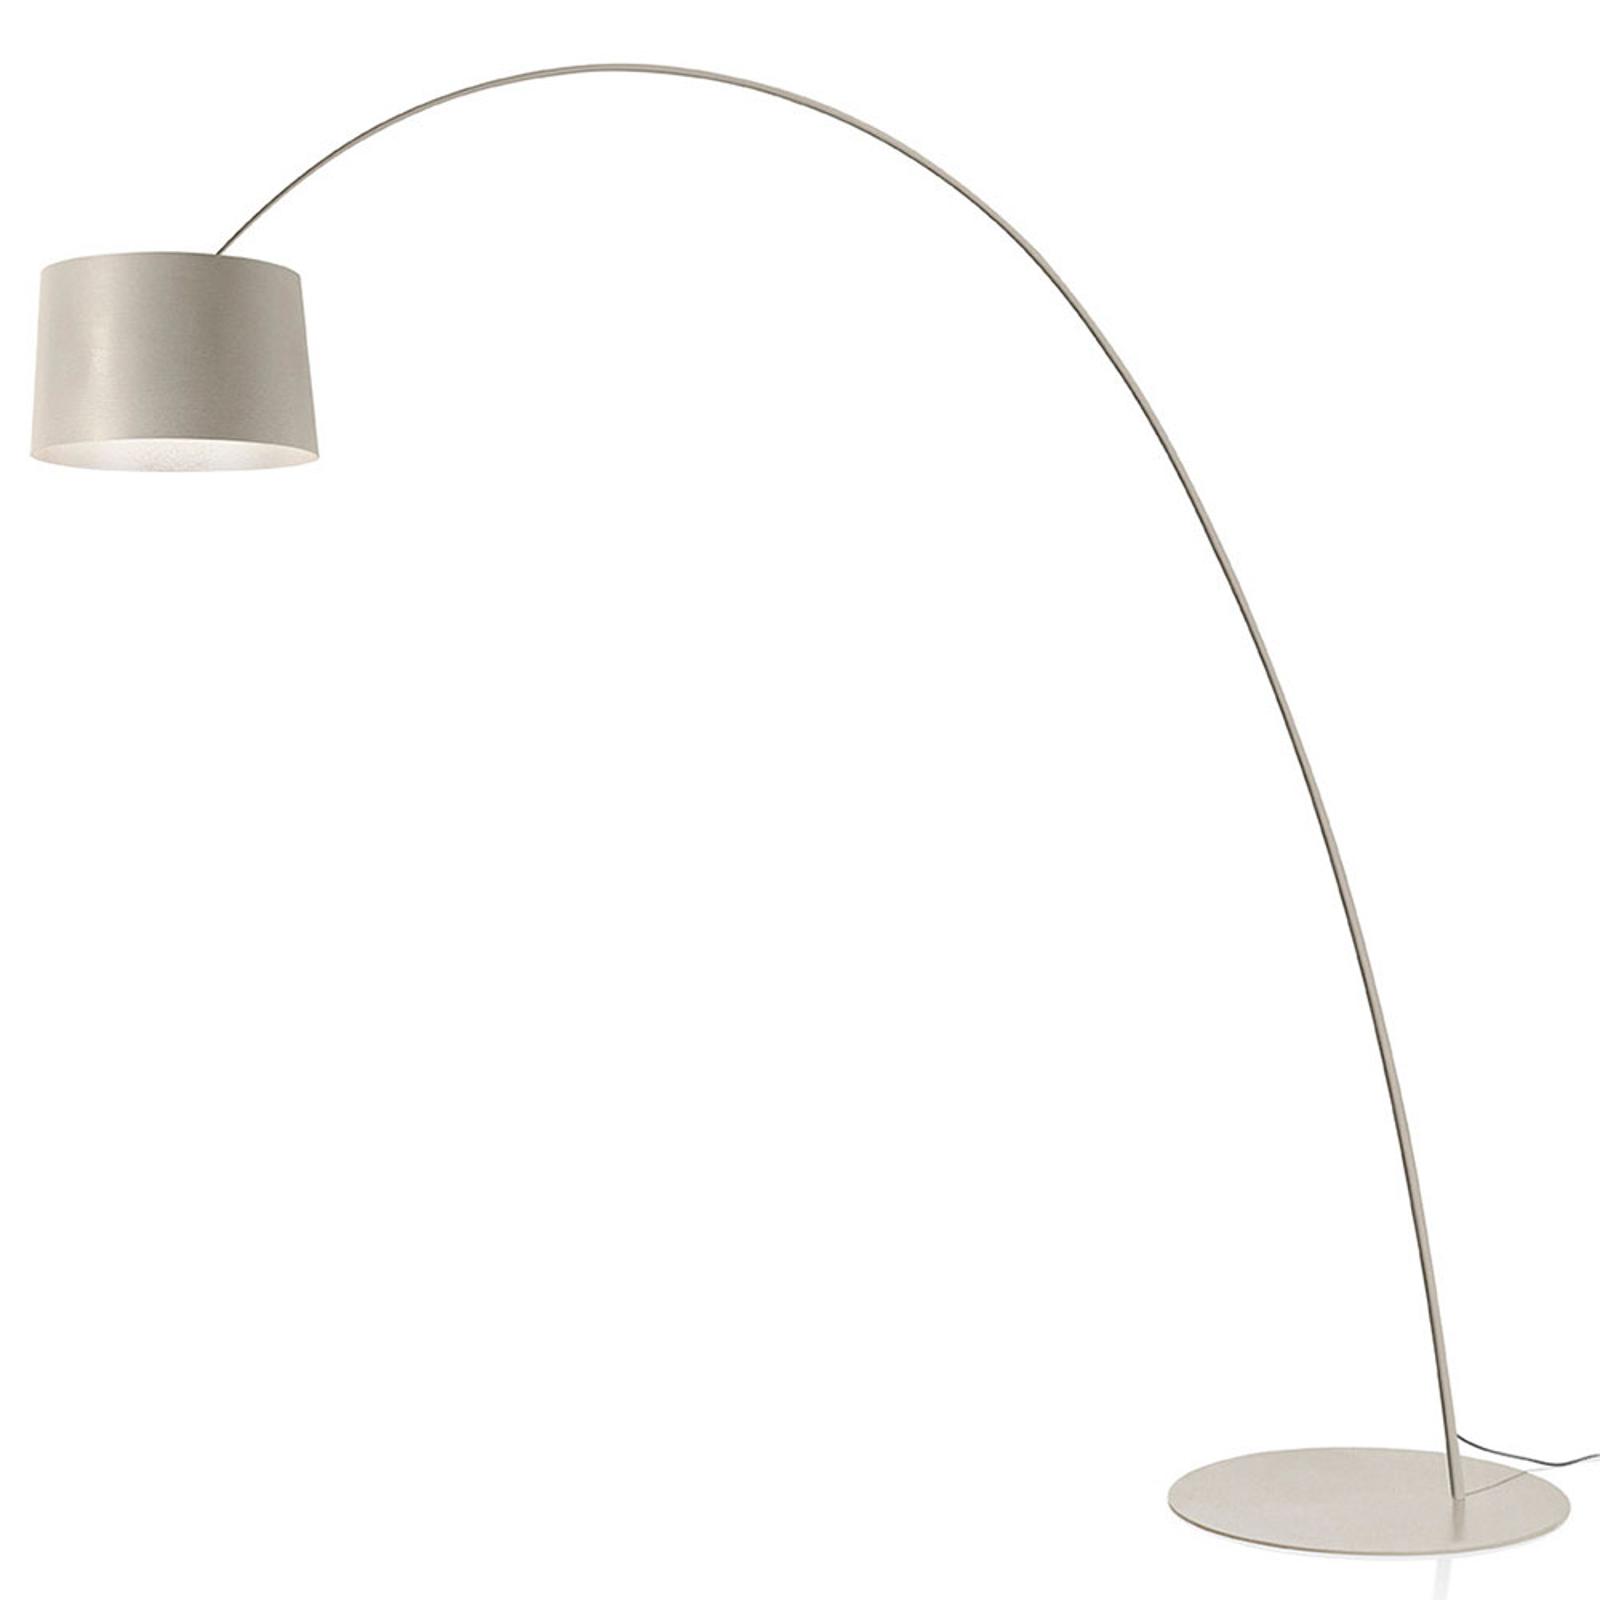 Foscarini Twiggy MyLight LED-gulvlampe greige